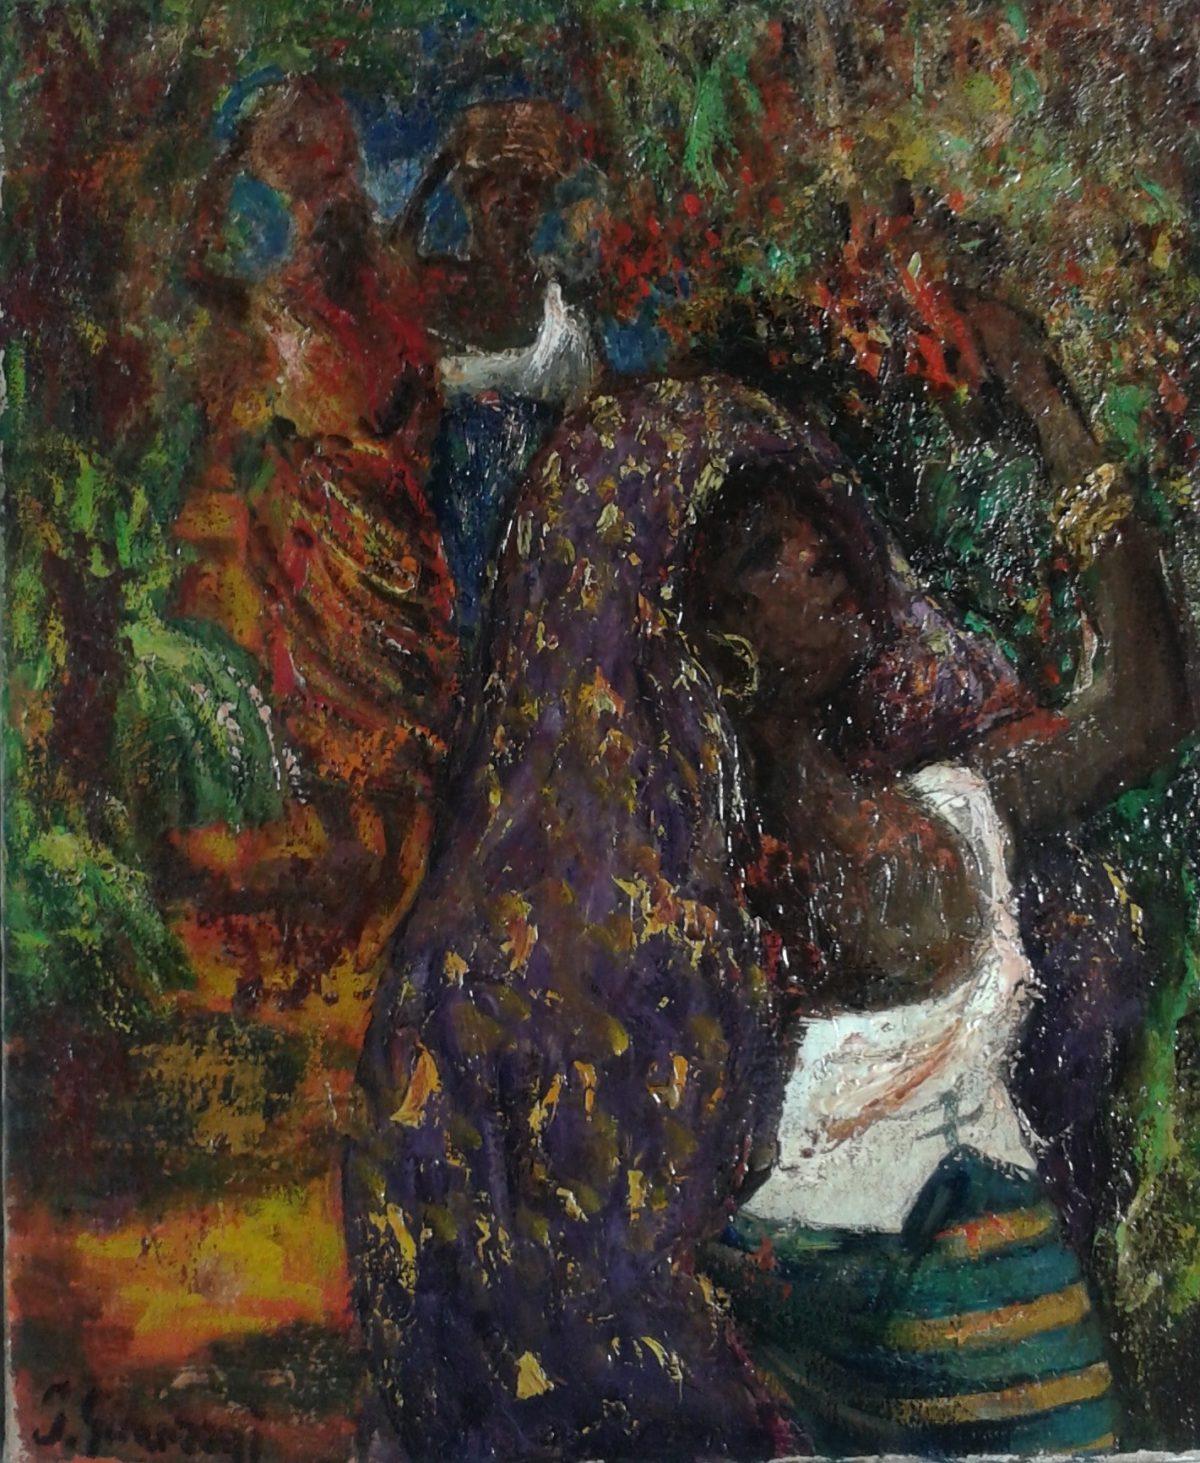 gilardoni joseph femmes peuls afrique